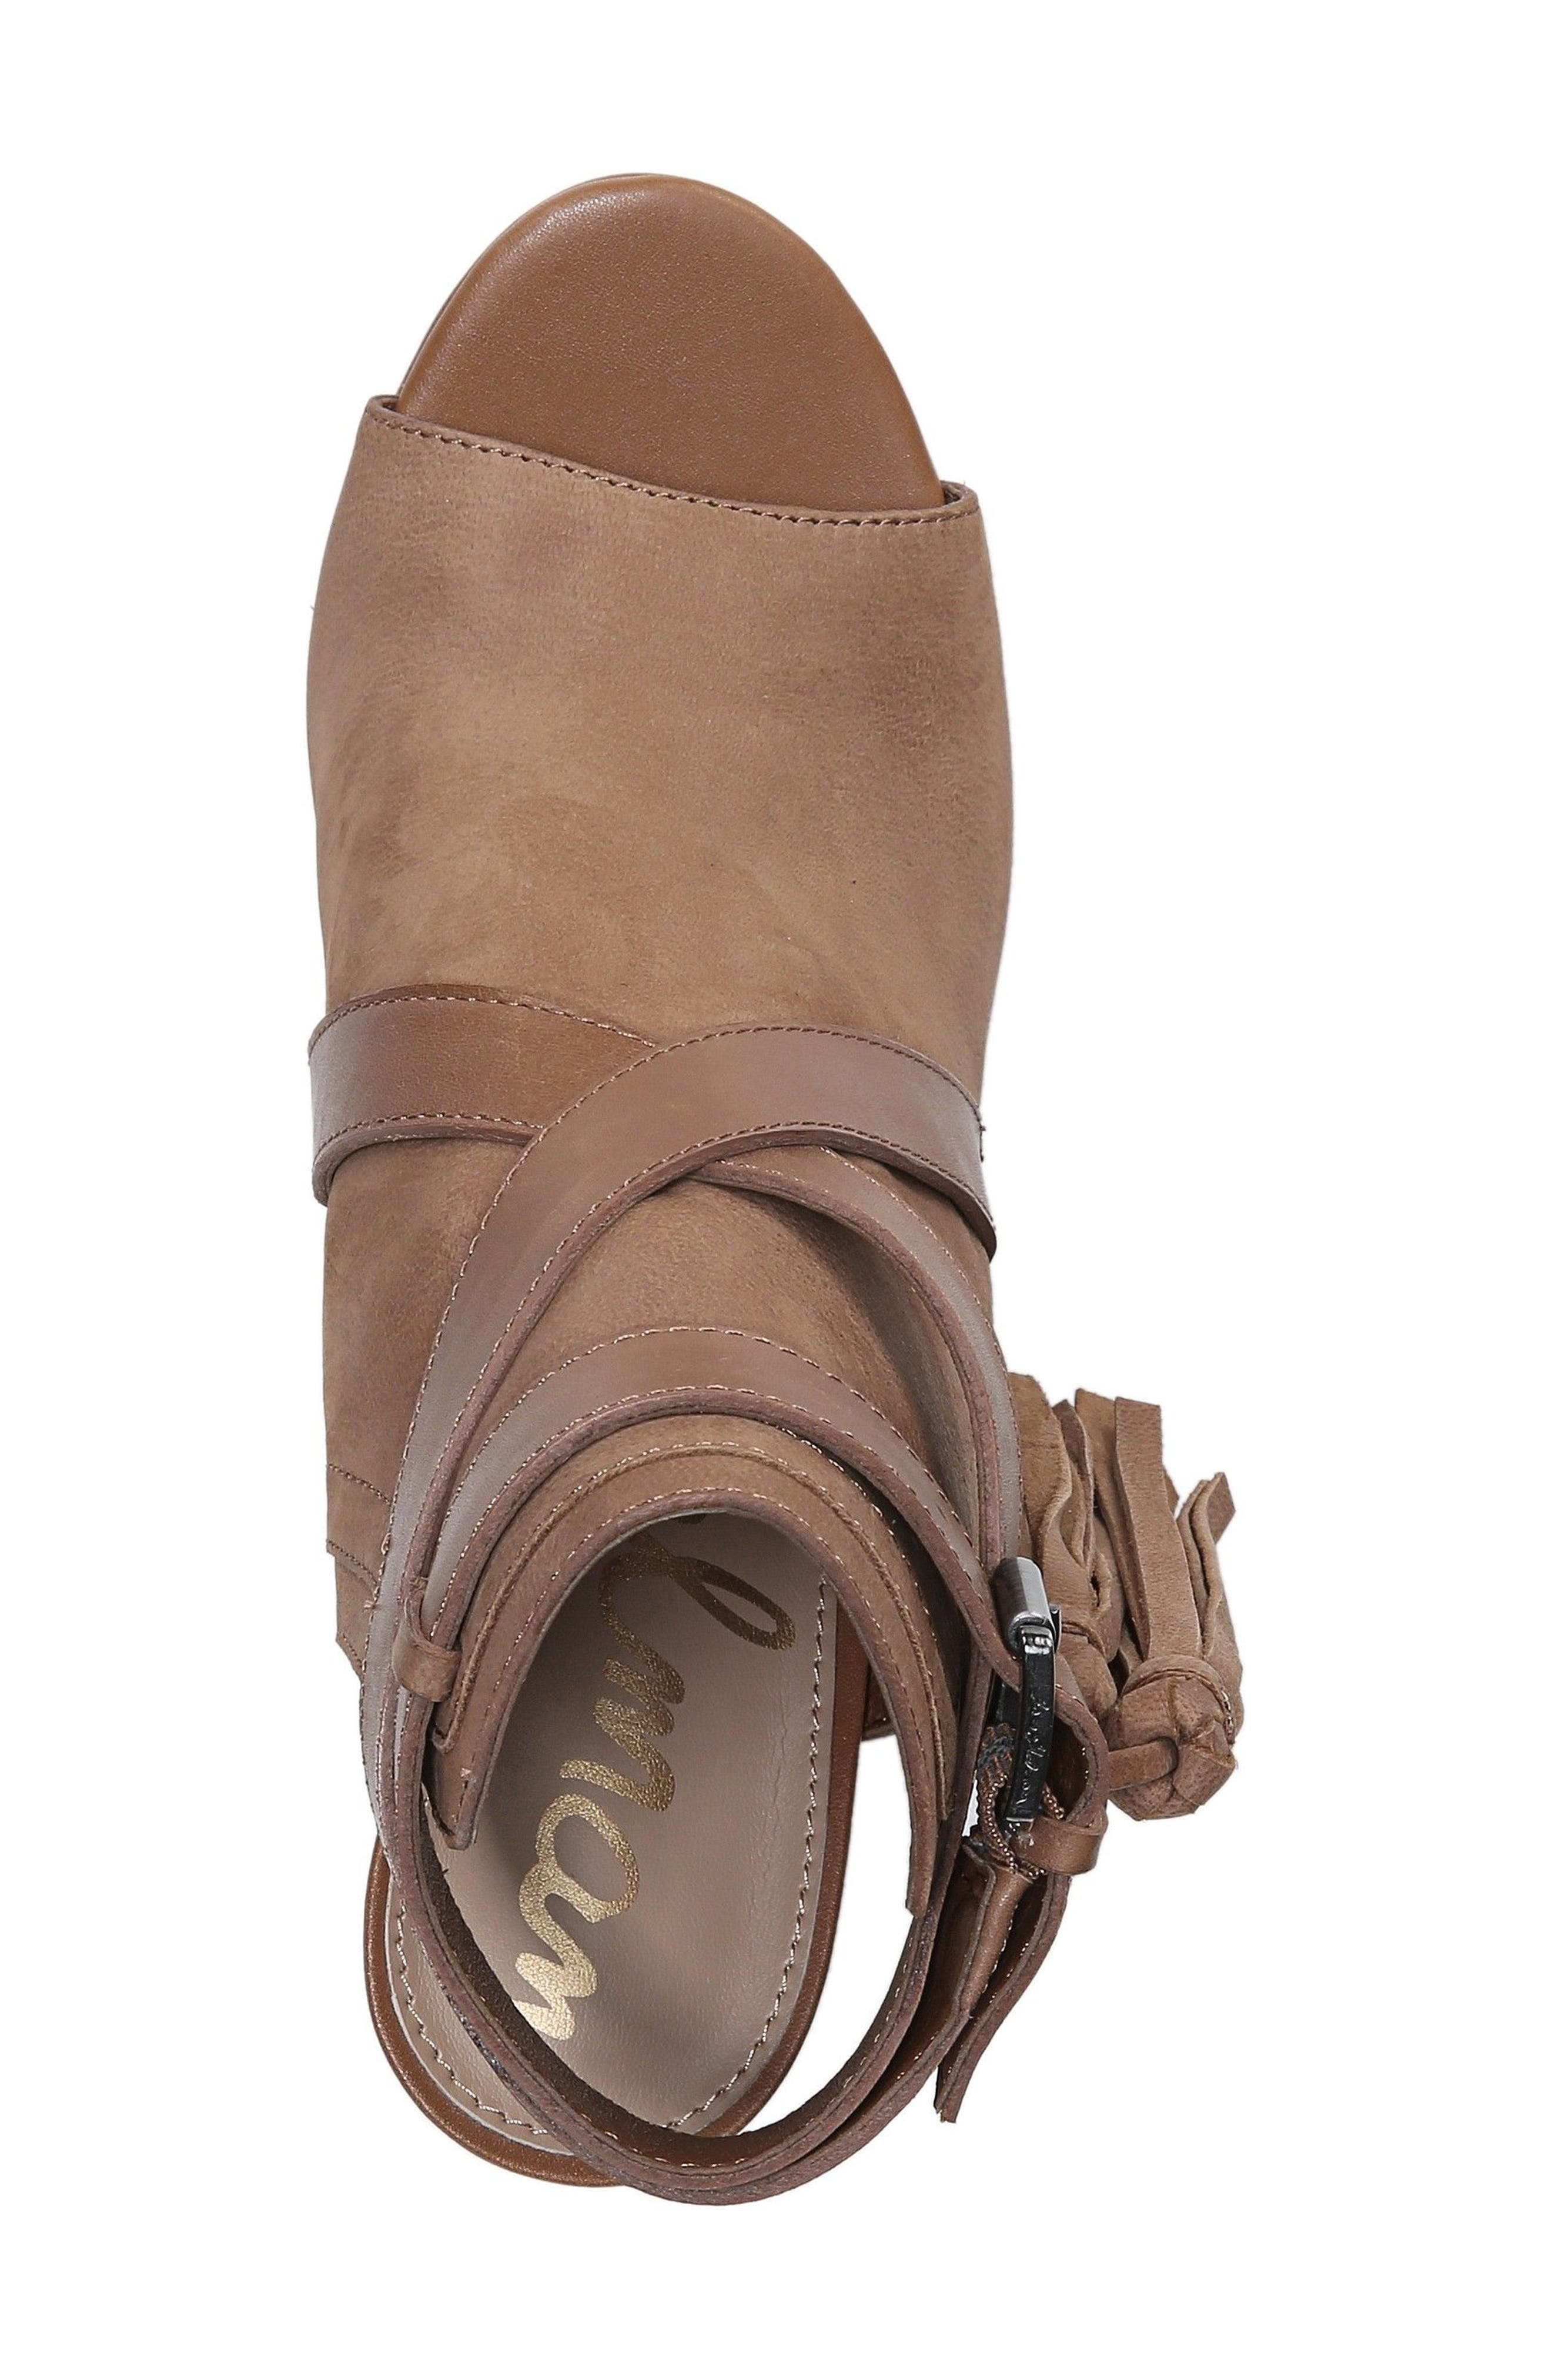 Vermont Block Heel Sandal,                             Alternate thumbnail 5, color,                             Deep Saddle Nubuck Leather